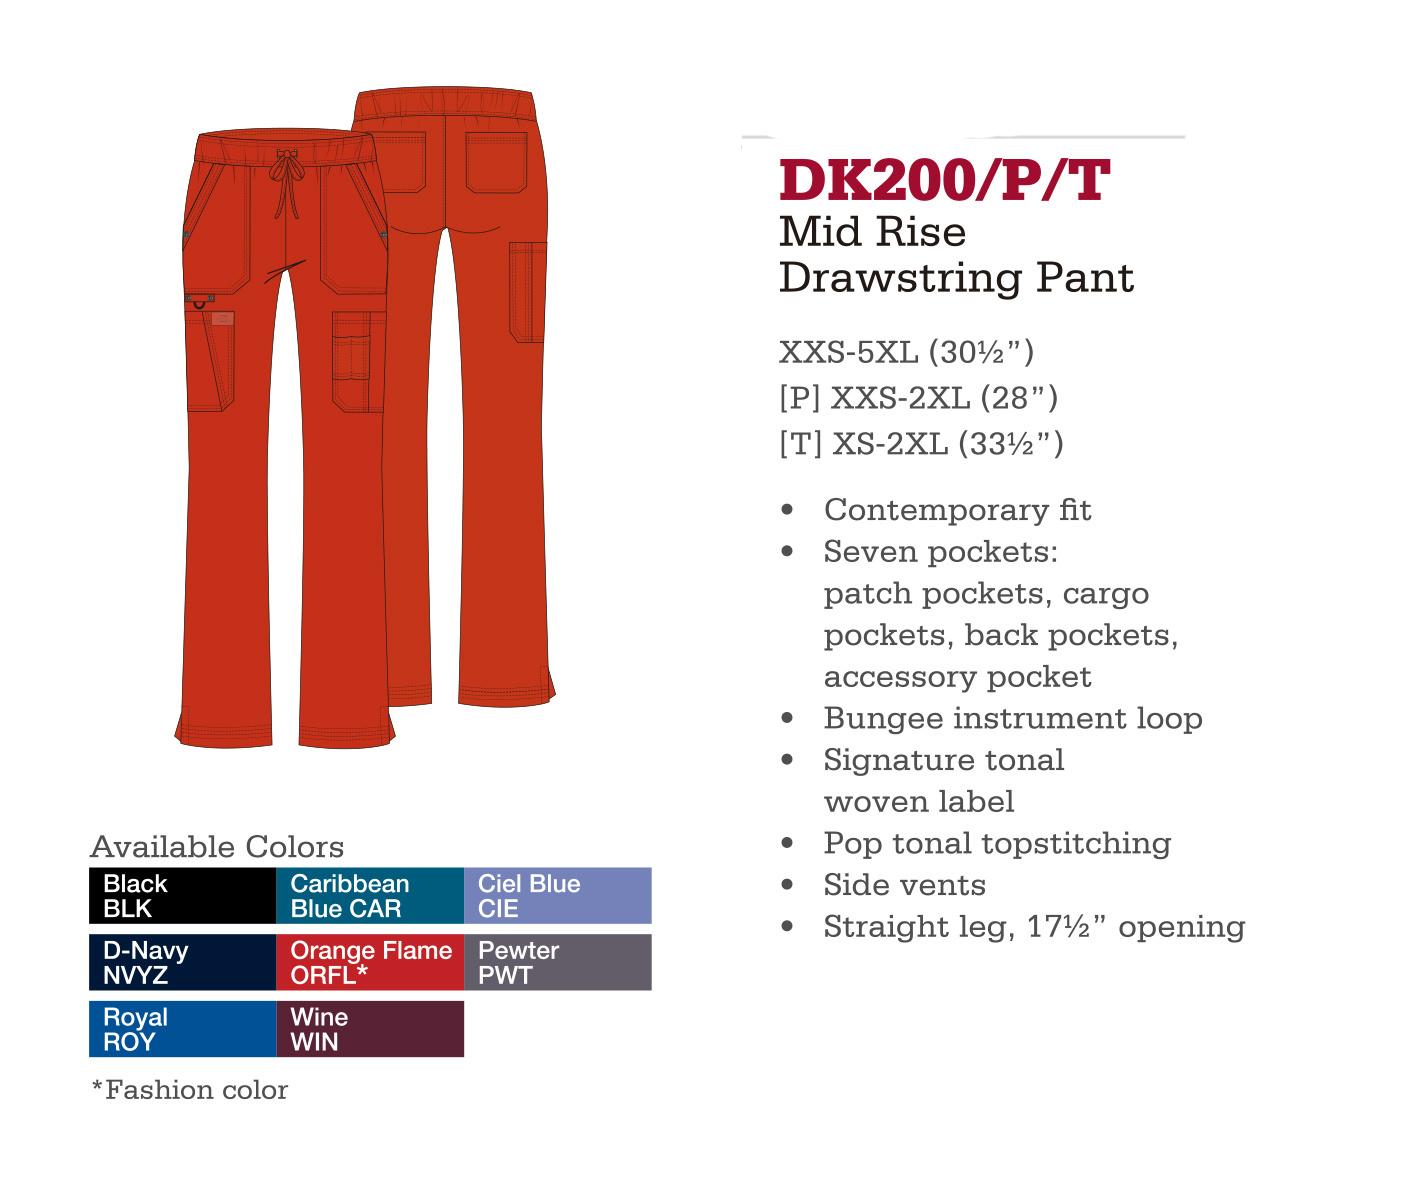 Pantalón con Cordones a Medio Levantar. DK200/P/T.